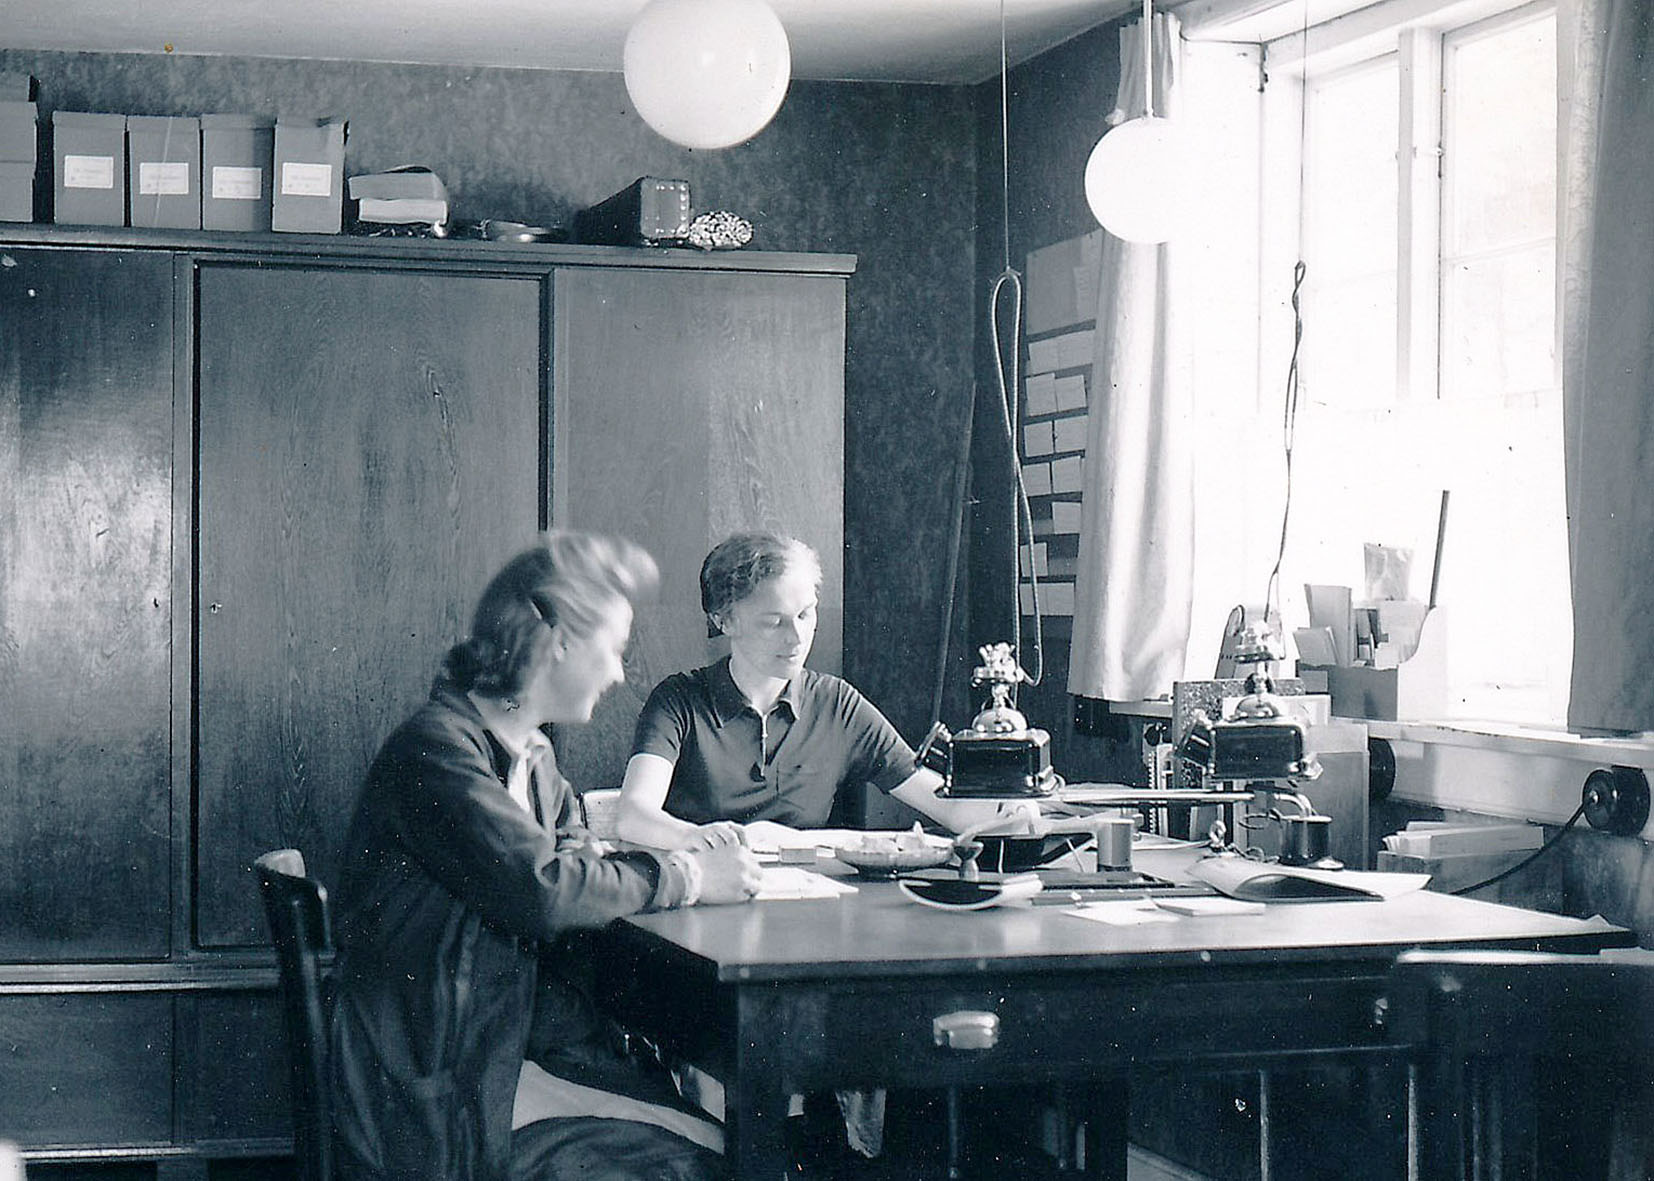 reci-serviceafdeling-ca.1935